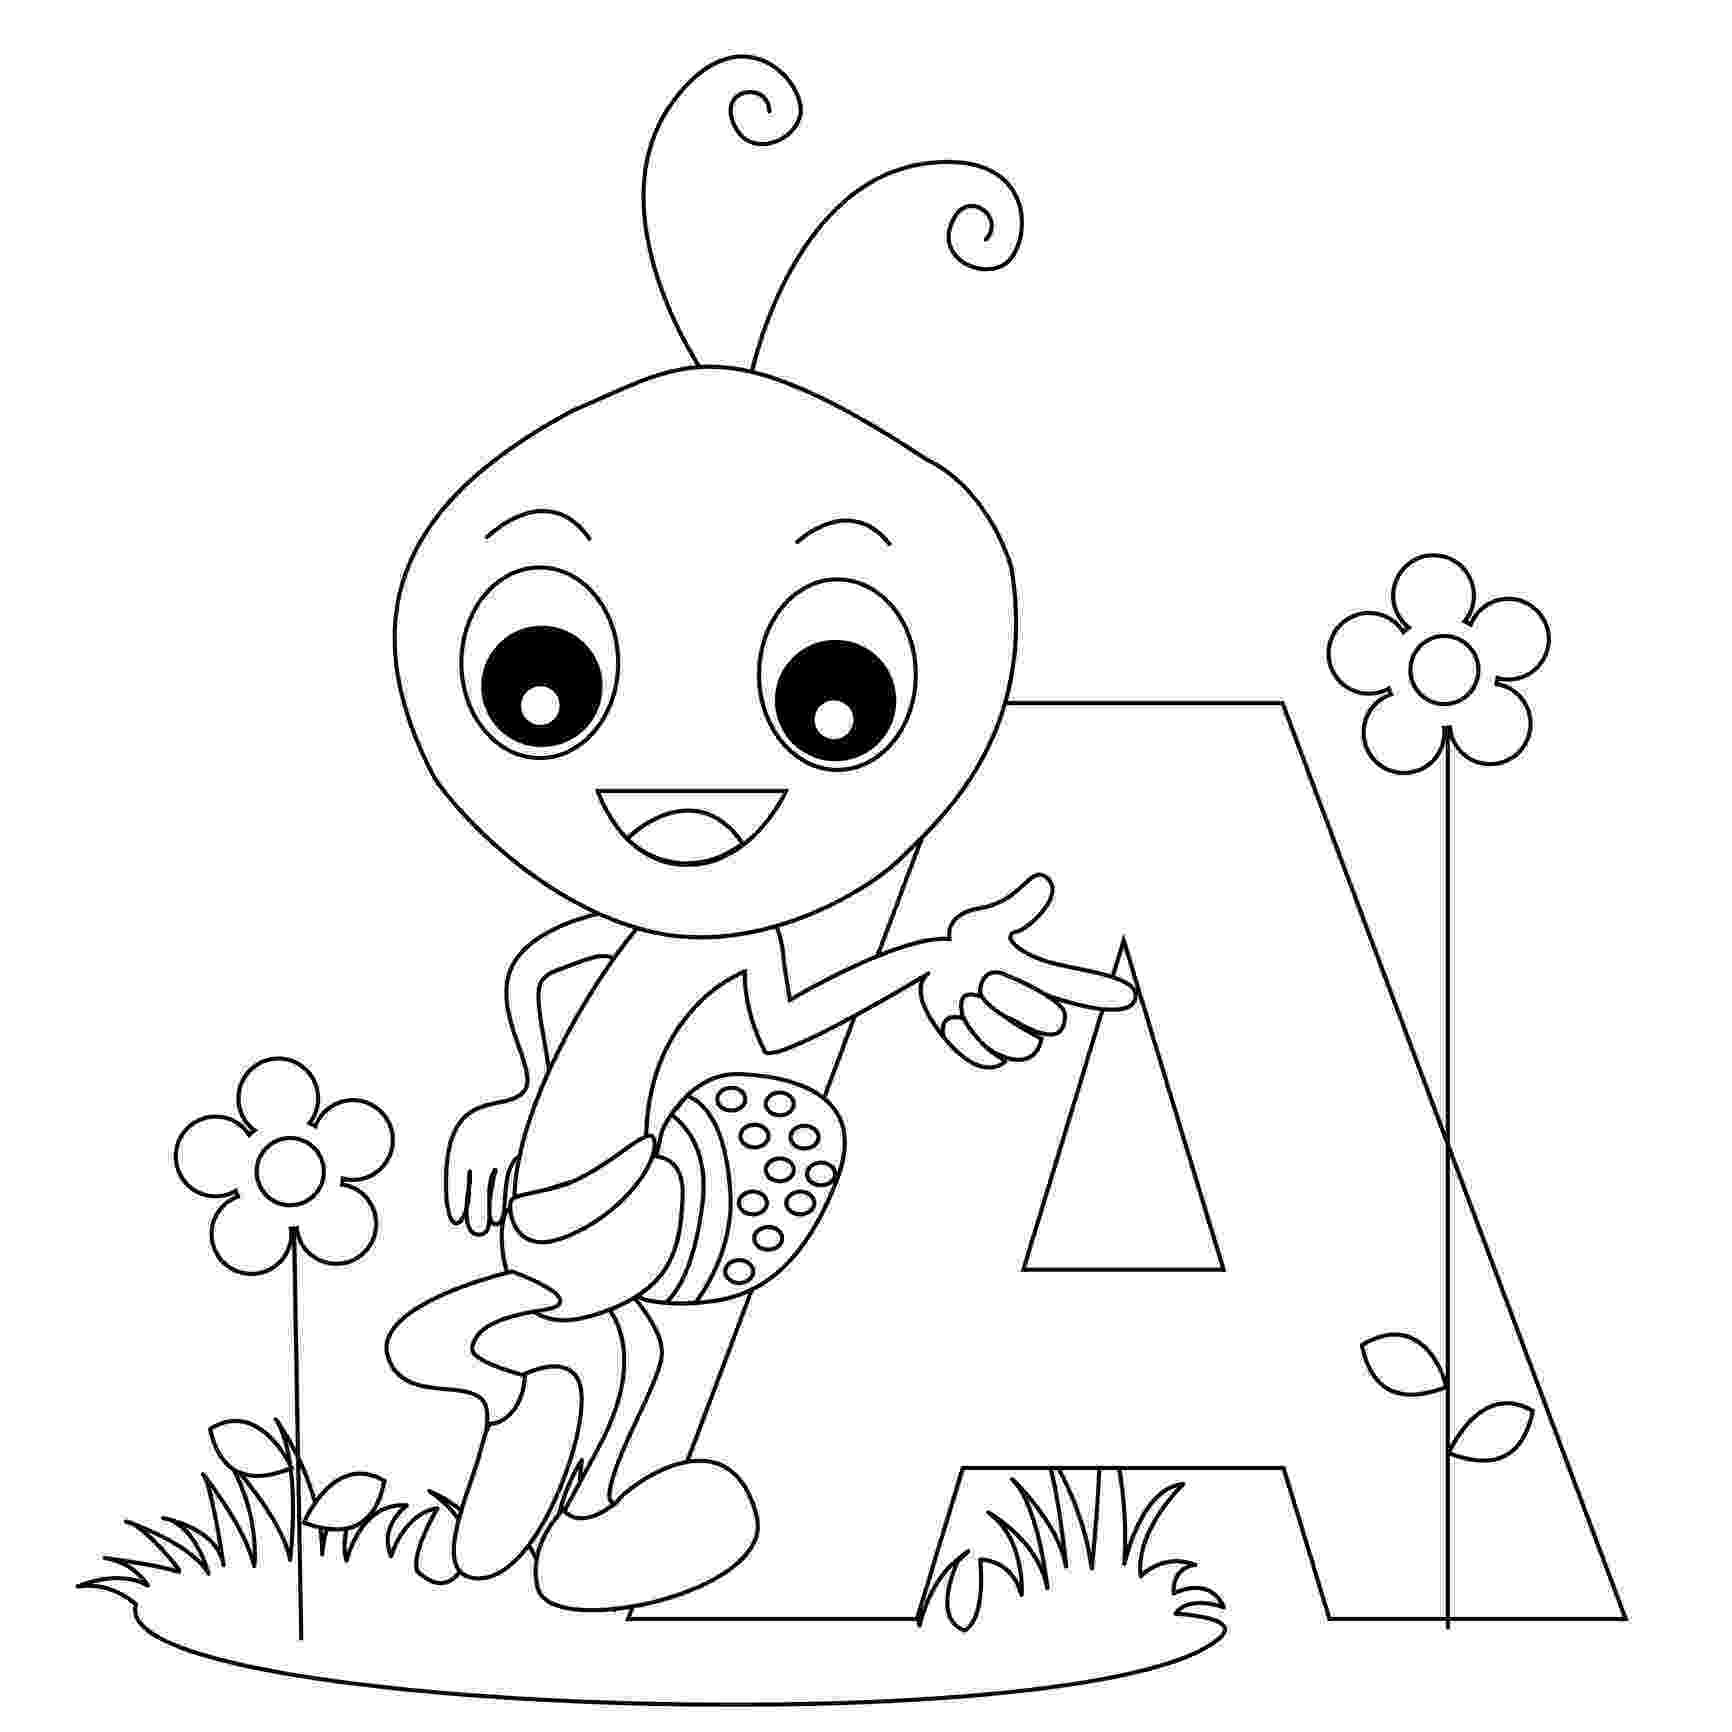 coloring animal alphabet free printable alphabet coloring pages for kids best alphabet coloring animal 1 3